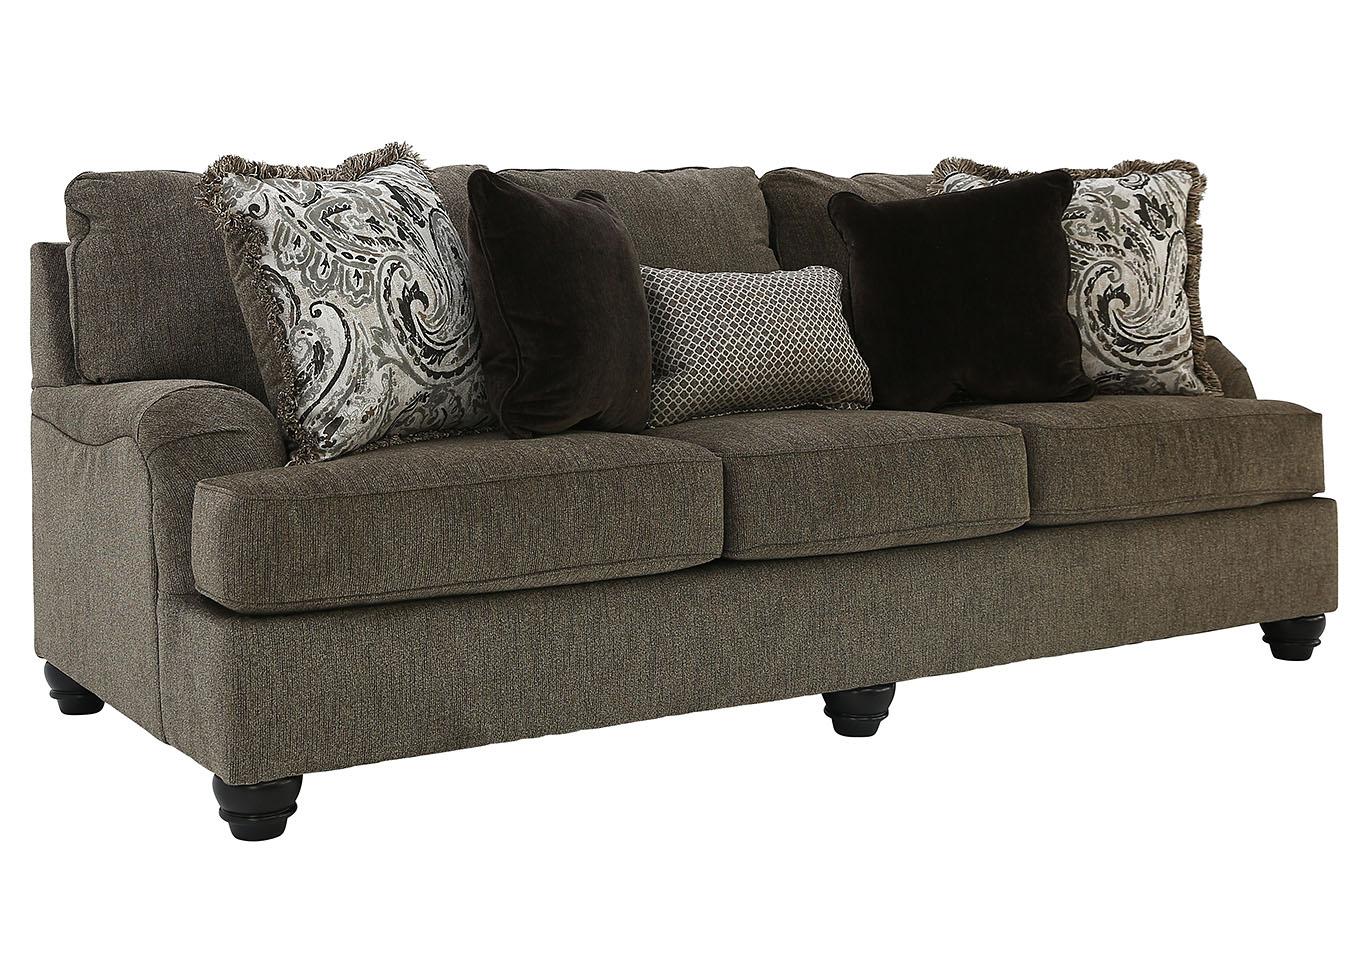 Ivan Smith Braemar Brown Sofa